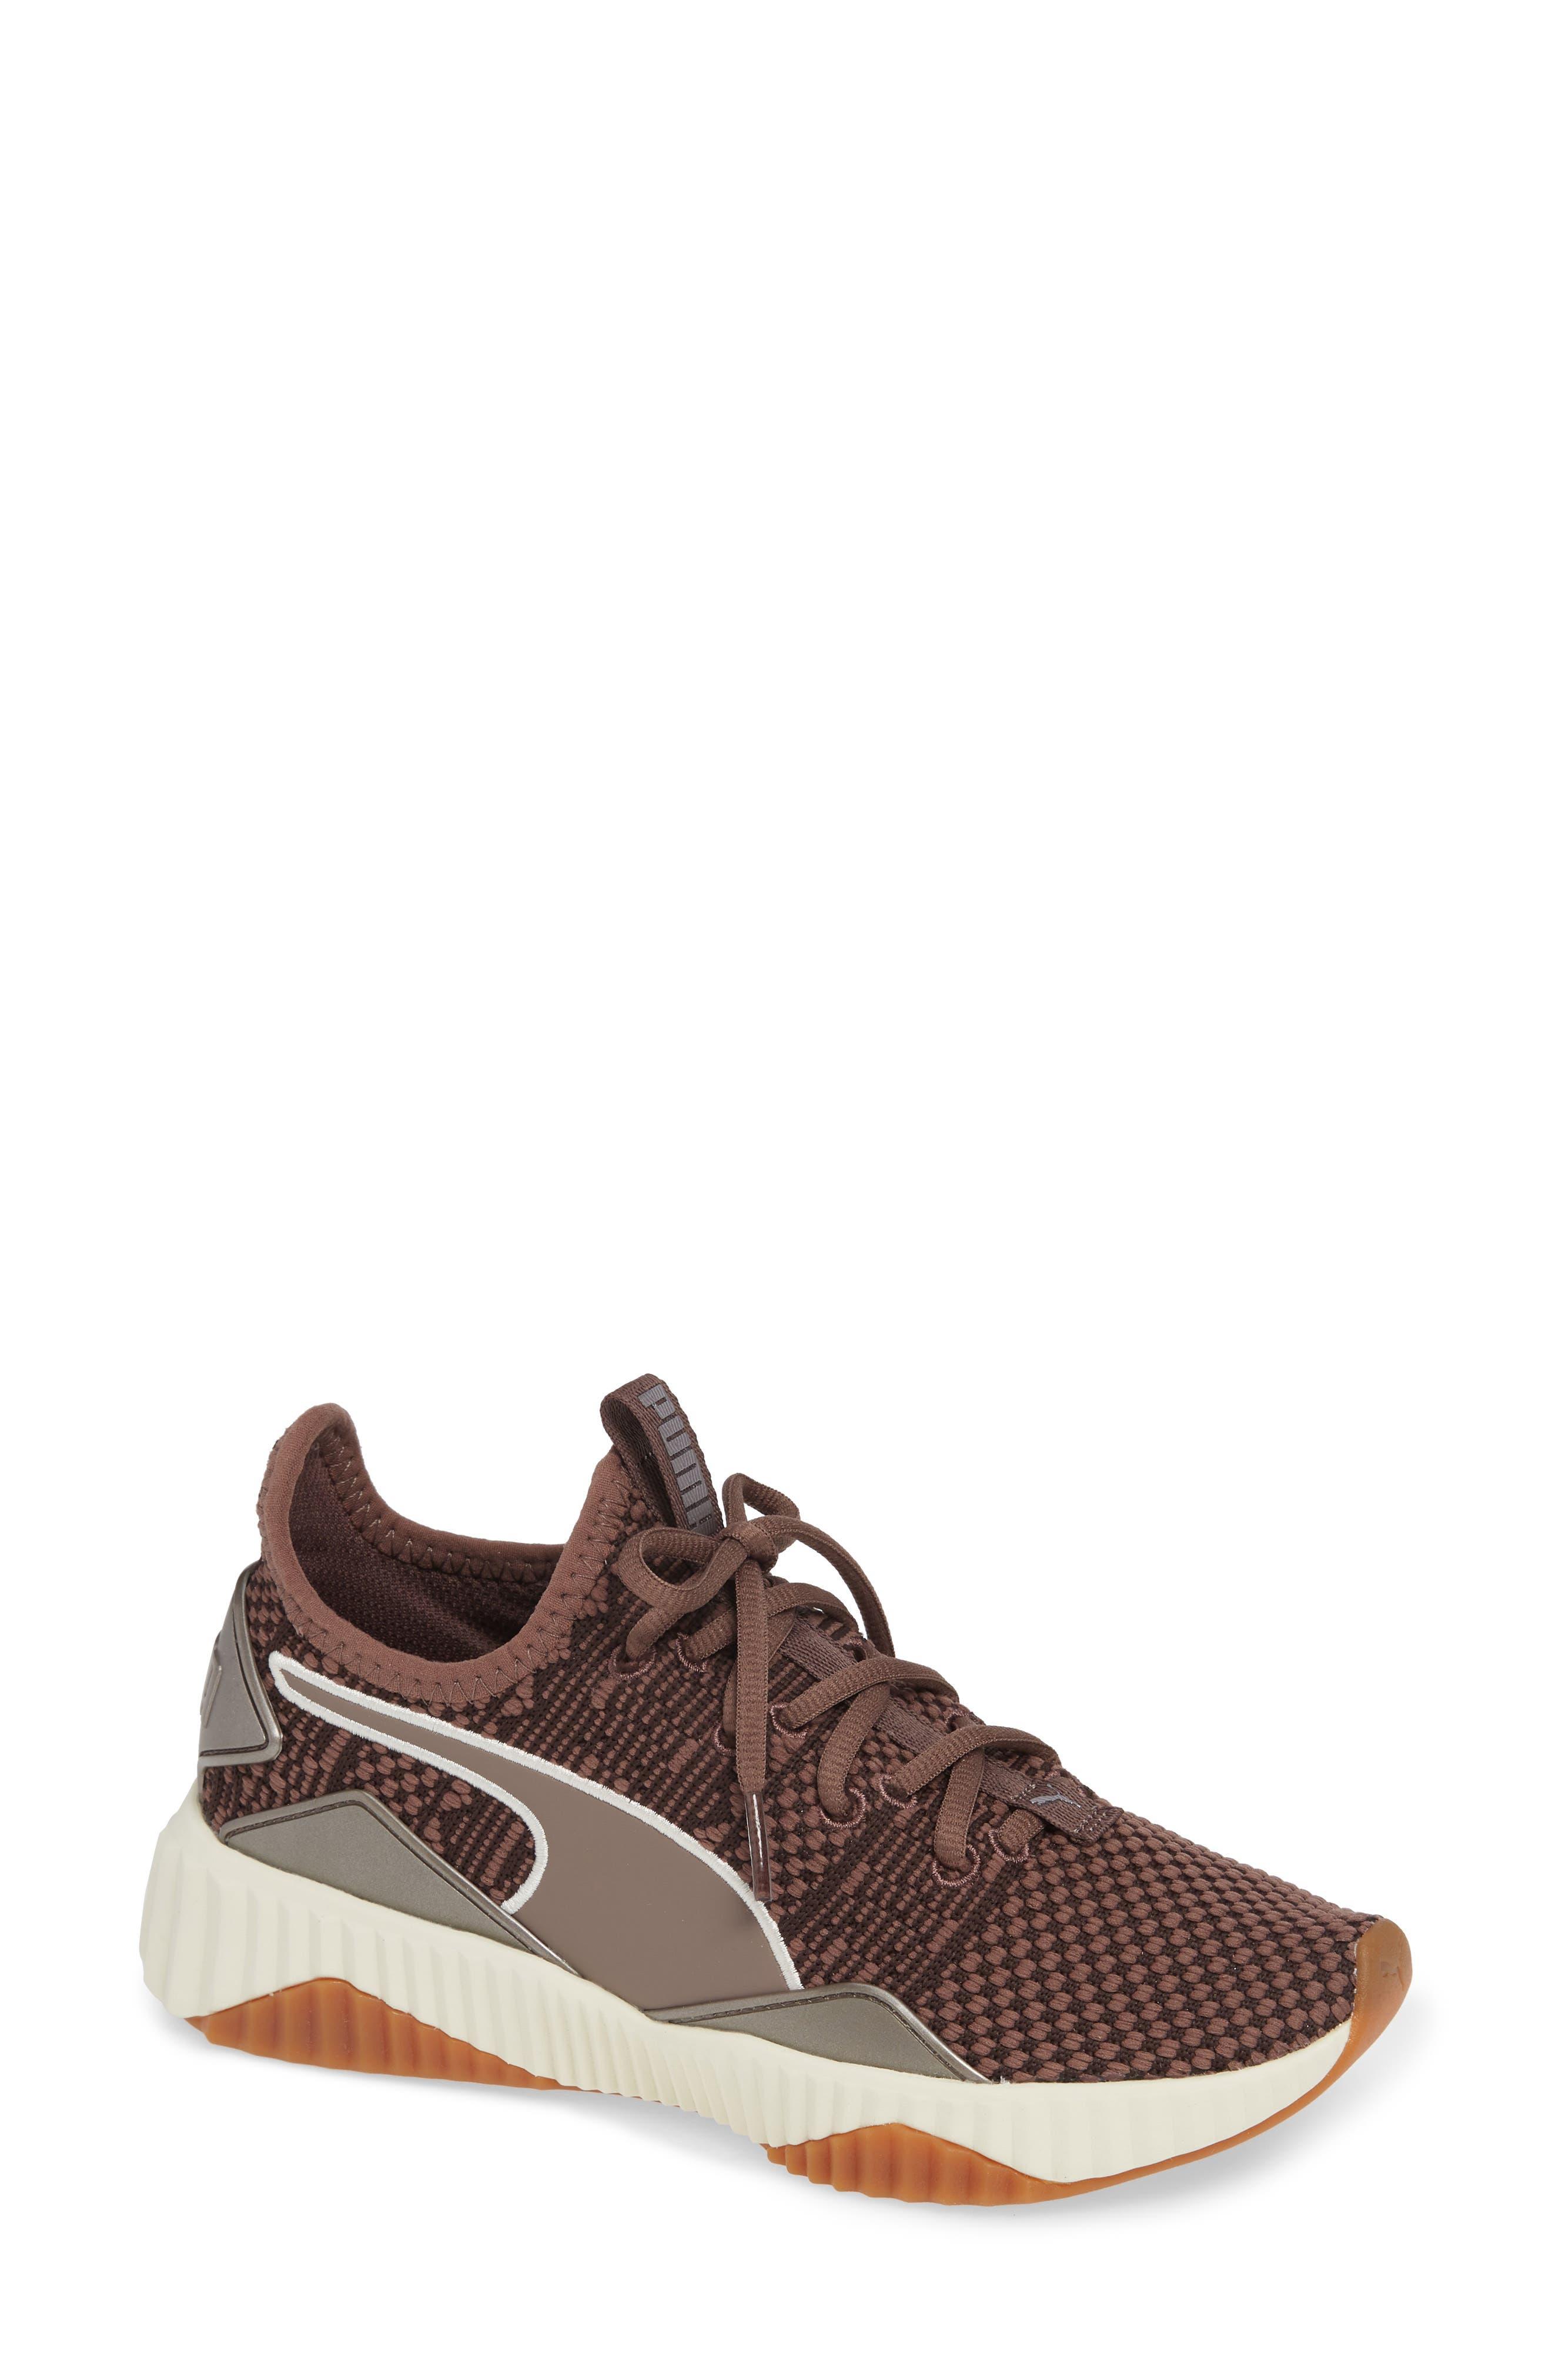 PUMA,                             Defy Luxe Sneaker,                             Main thumbnail 1, color,                             PEPPERCORN/ METALLIC ASH